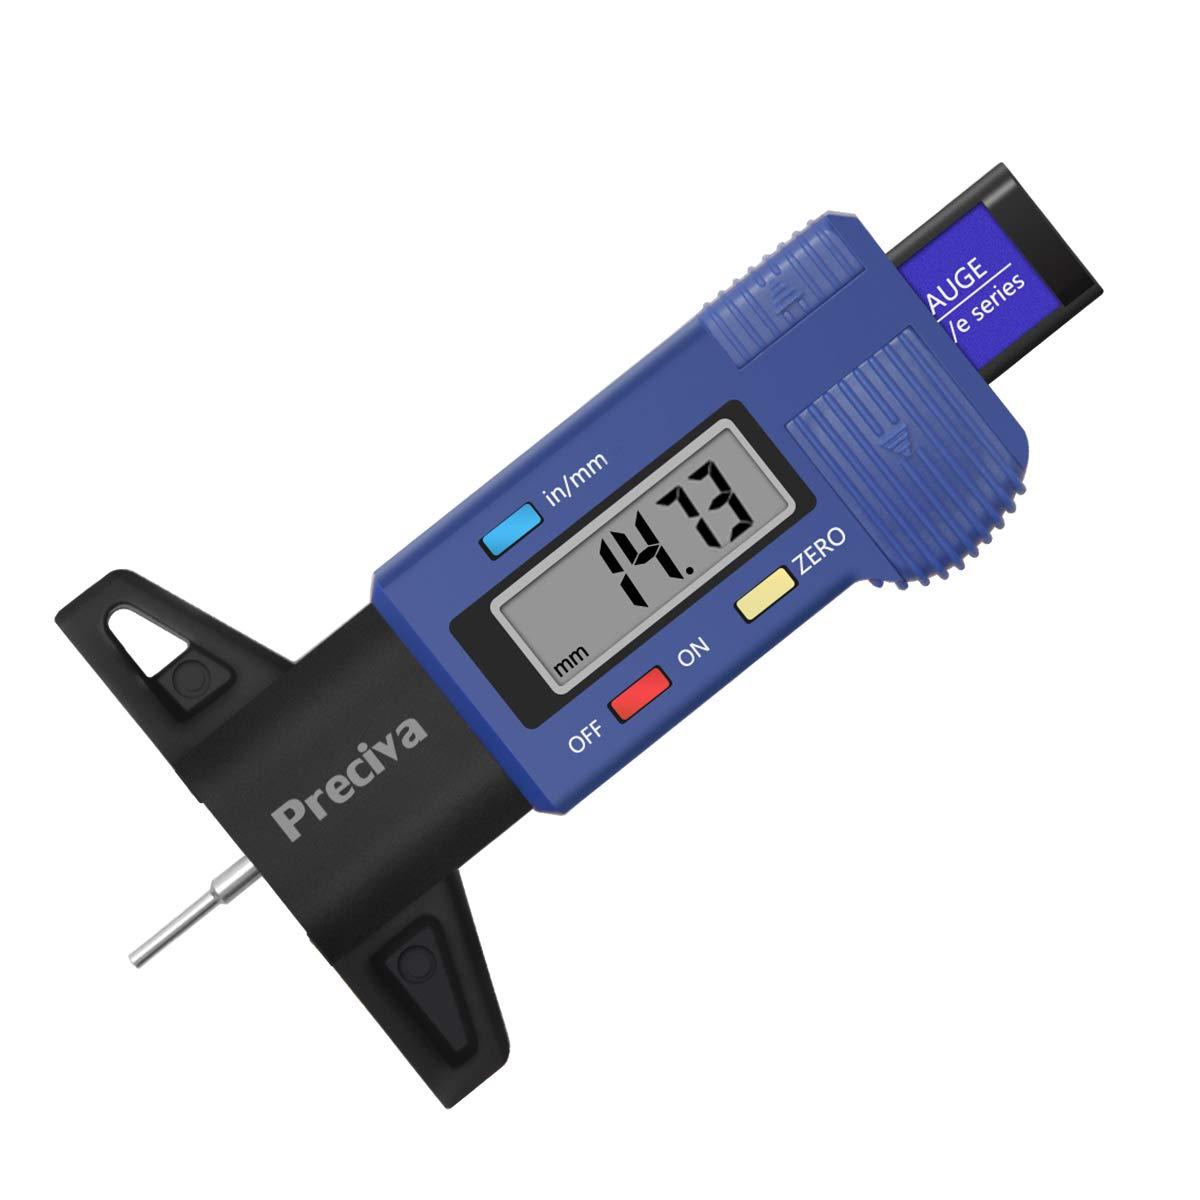 Digital Car Tire Tread Depth Tester 0-25mm Tyre Tread Depth Gauge Meter Measurer Tool Caliper LCD Display Tire Measurement